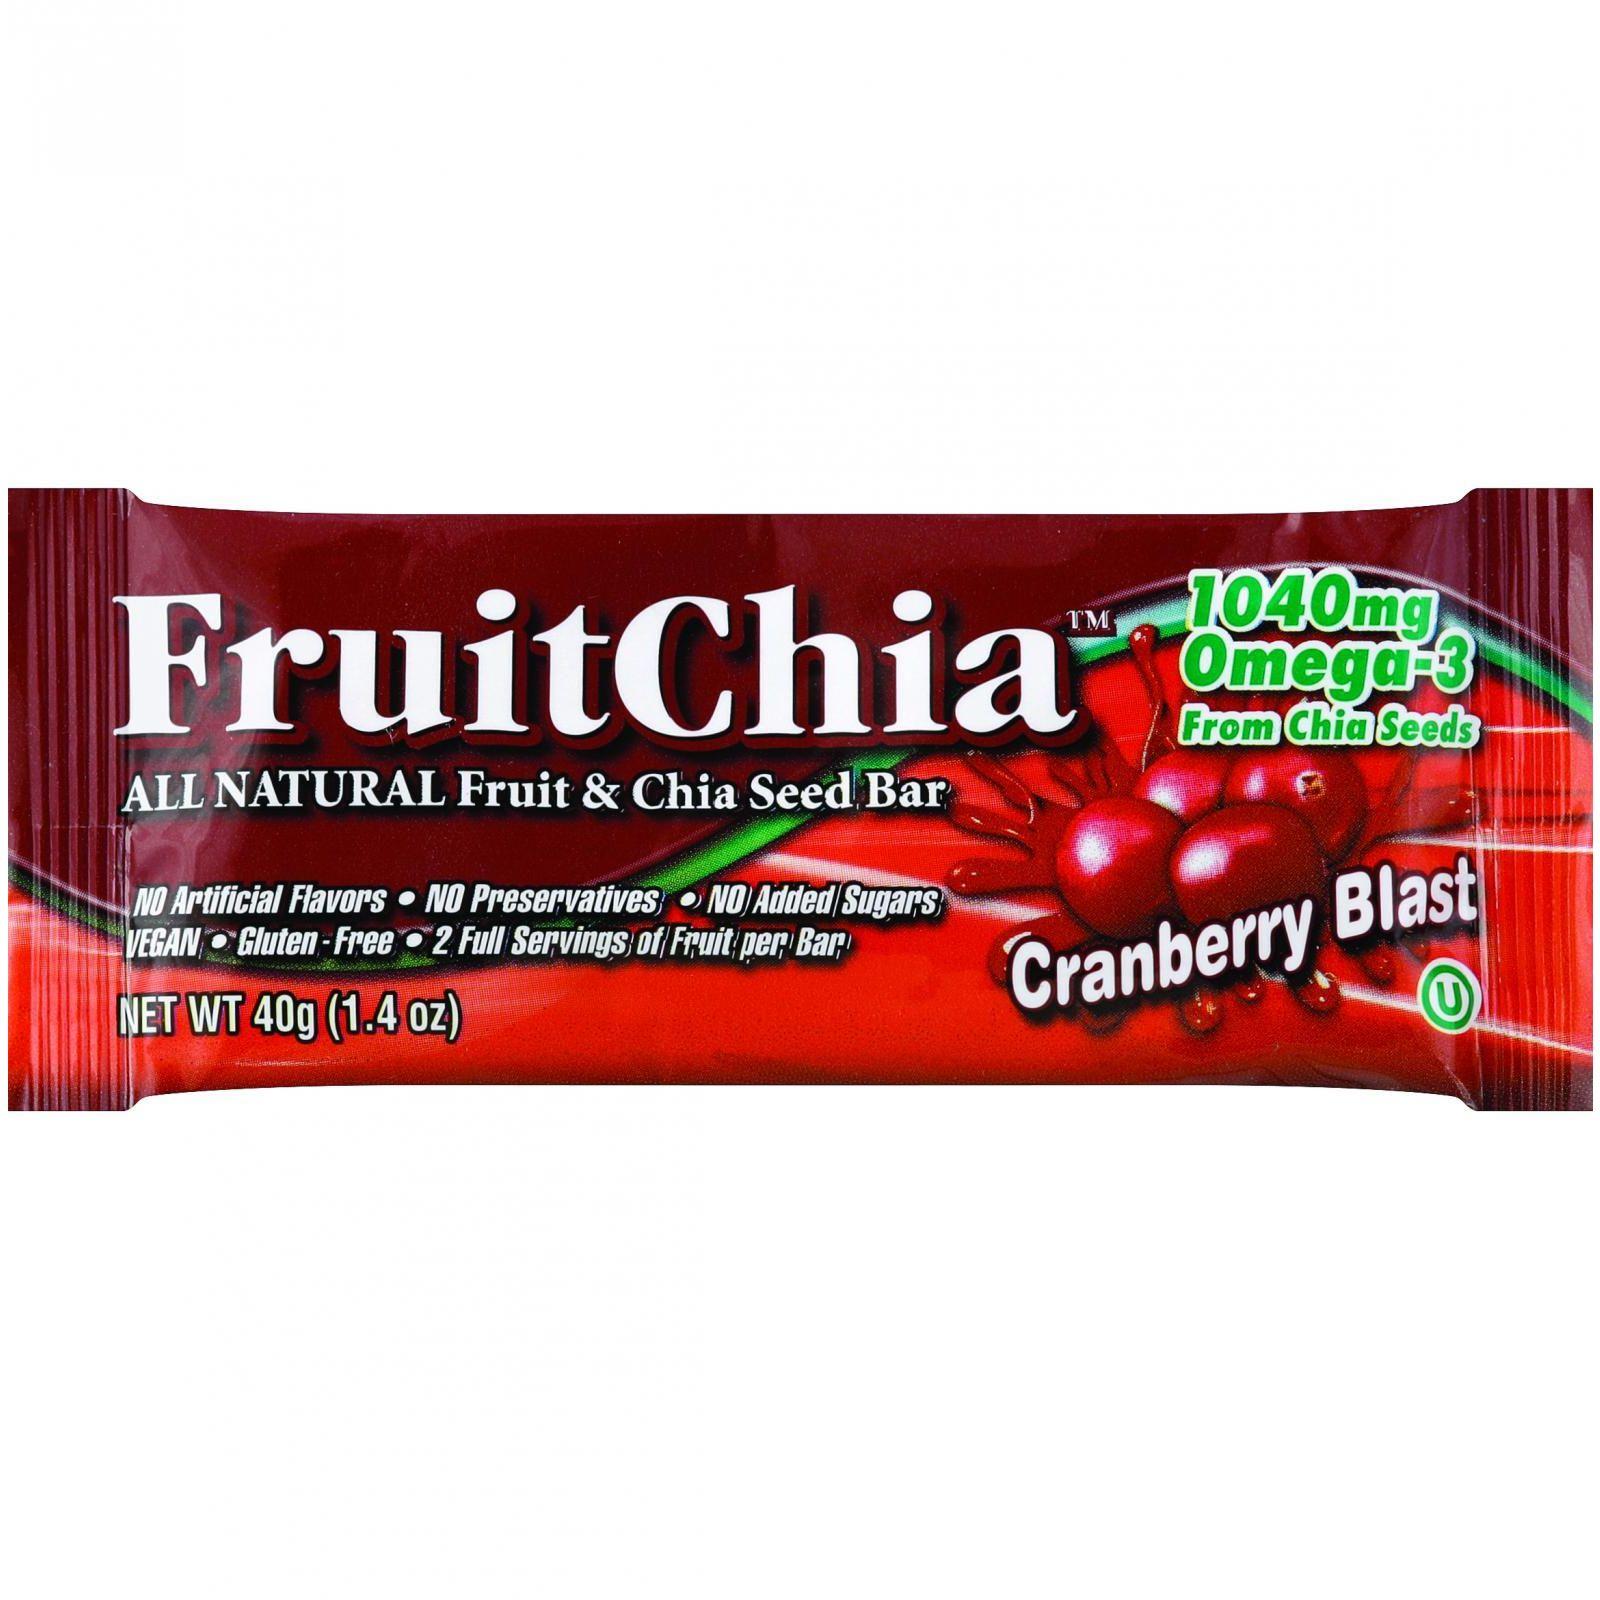 Fruit Chia Bar - Cranberry Blast - 1.4 oz Bars - Case of 24